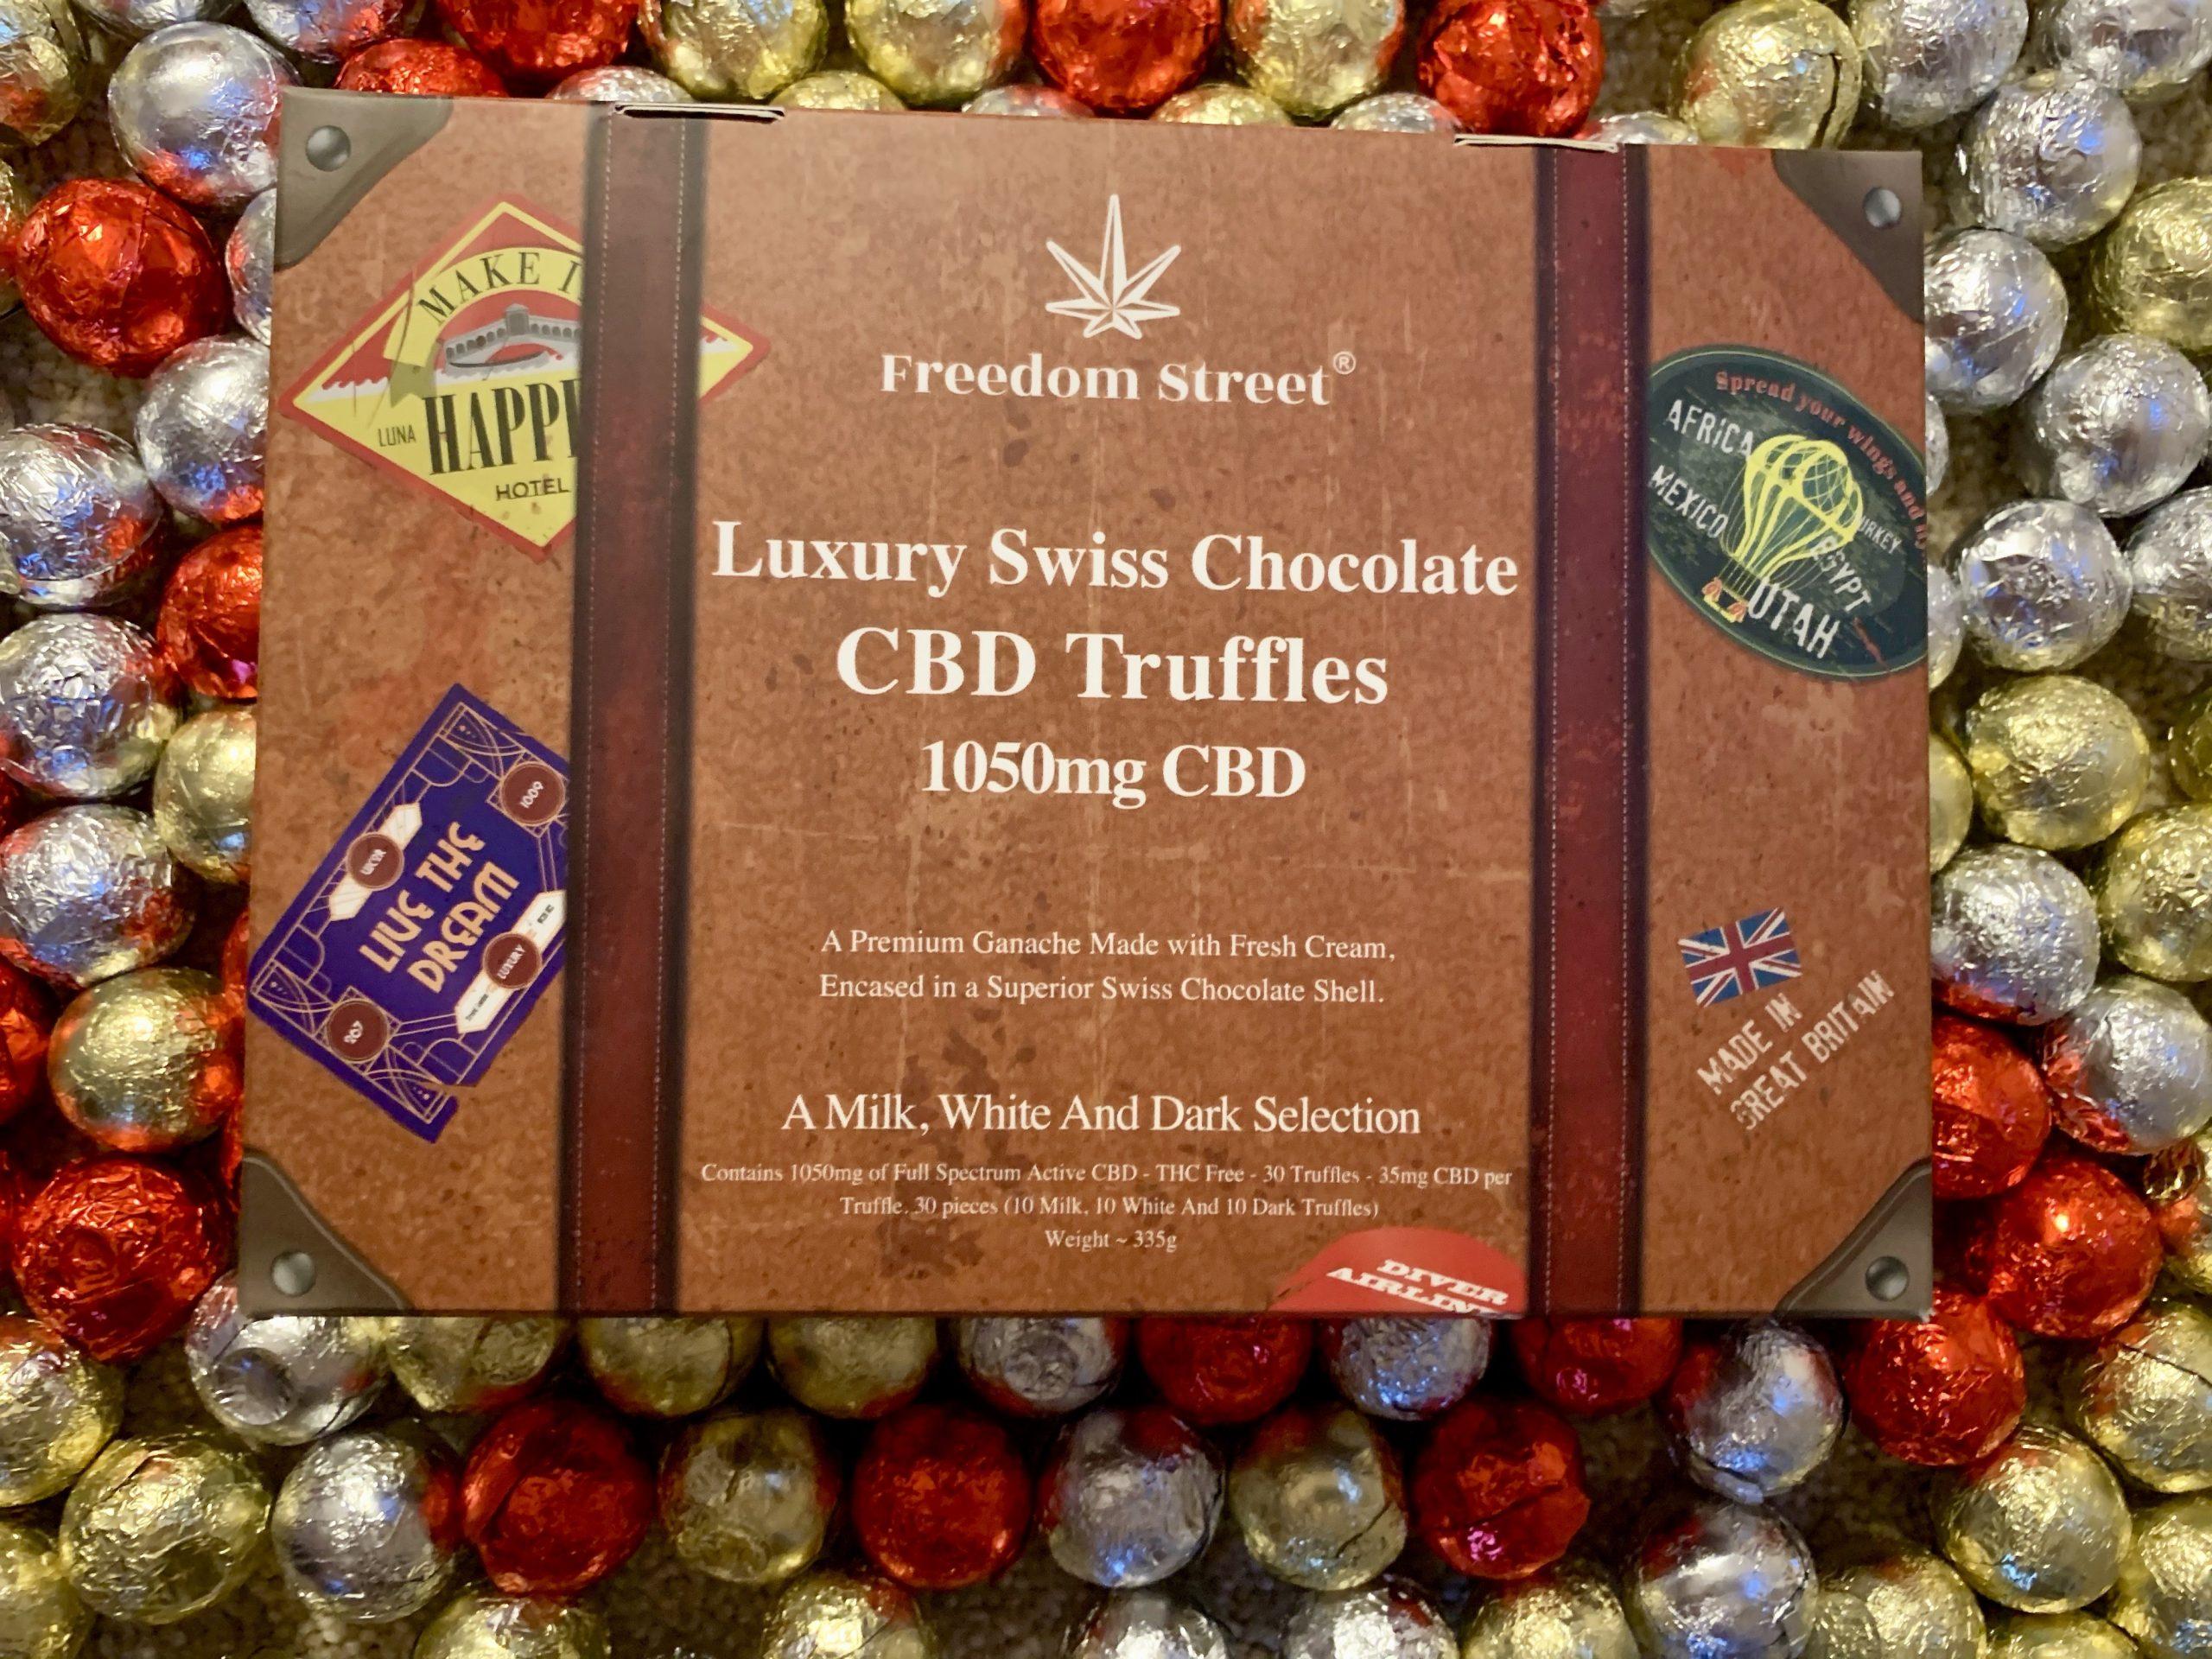 UK start-up announces launch of luxury CBD truffles